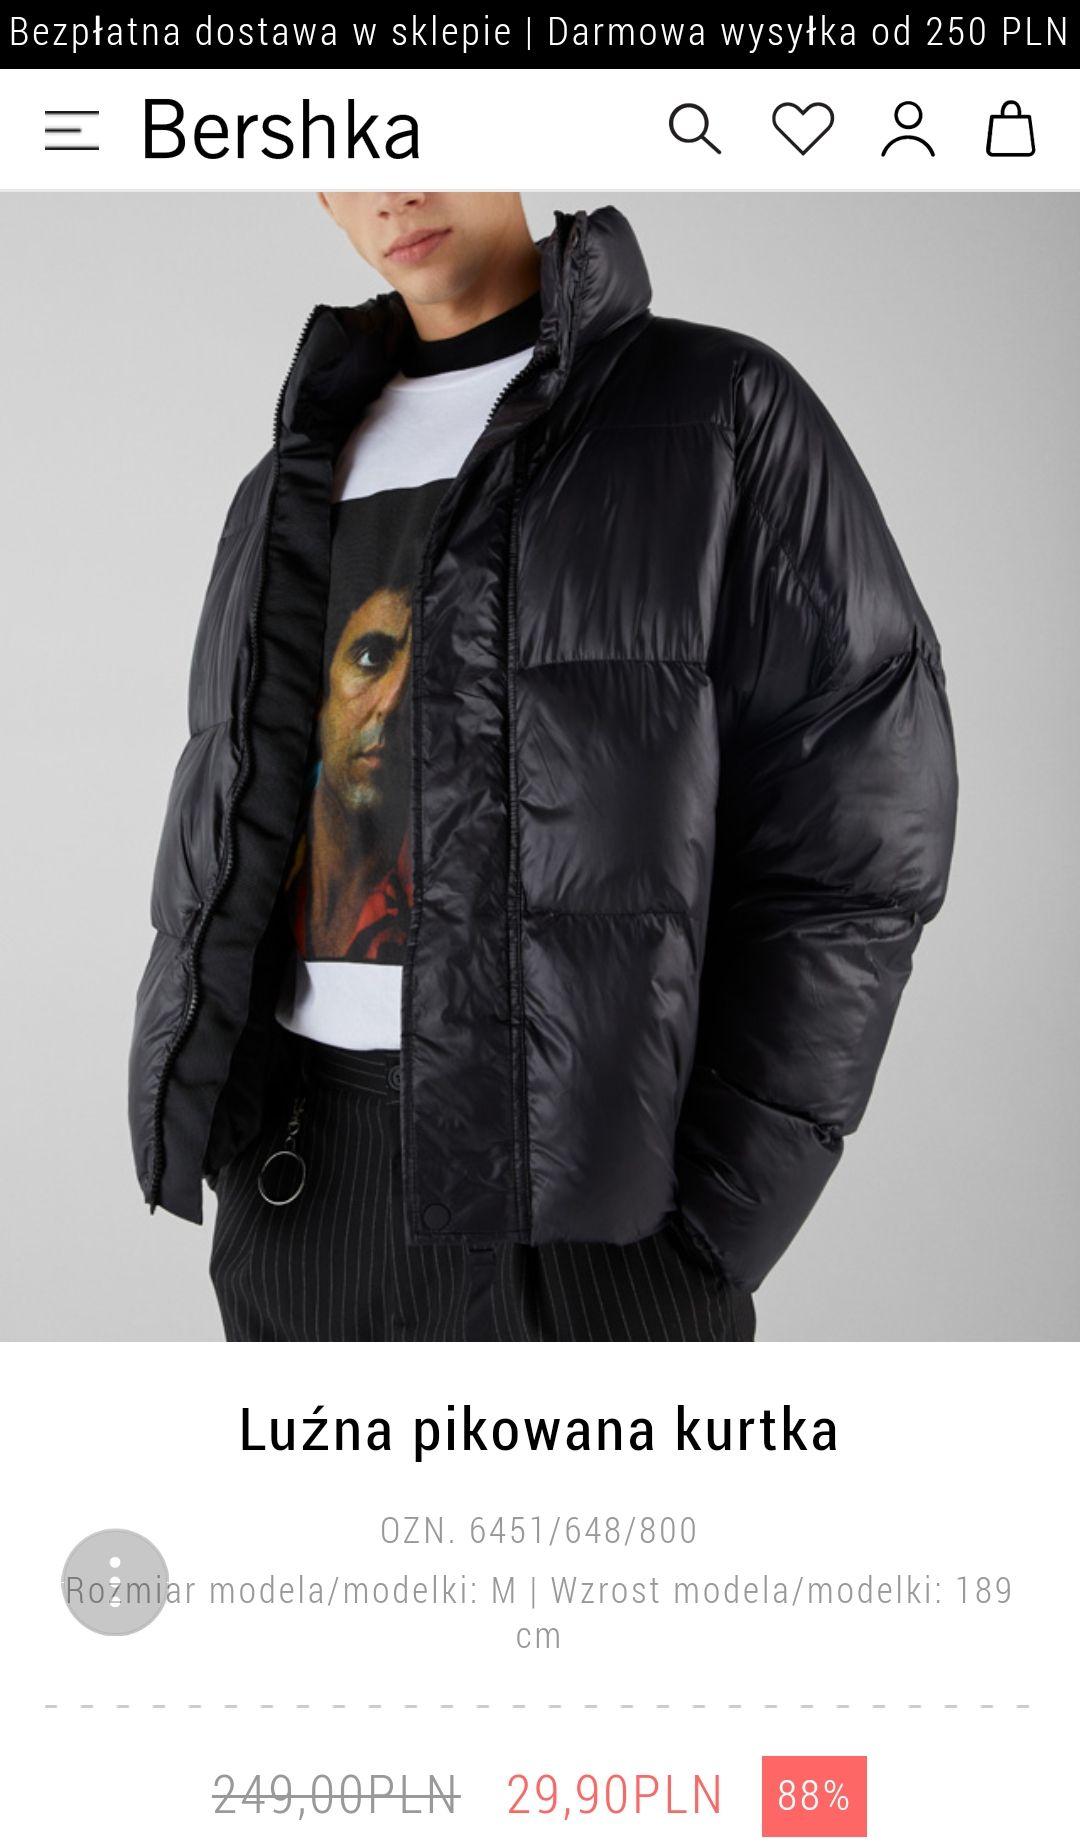 Bershka - męska kurtka pikowana